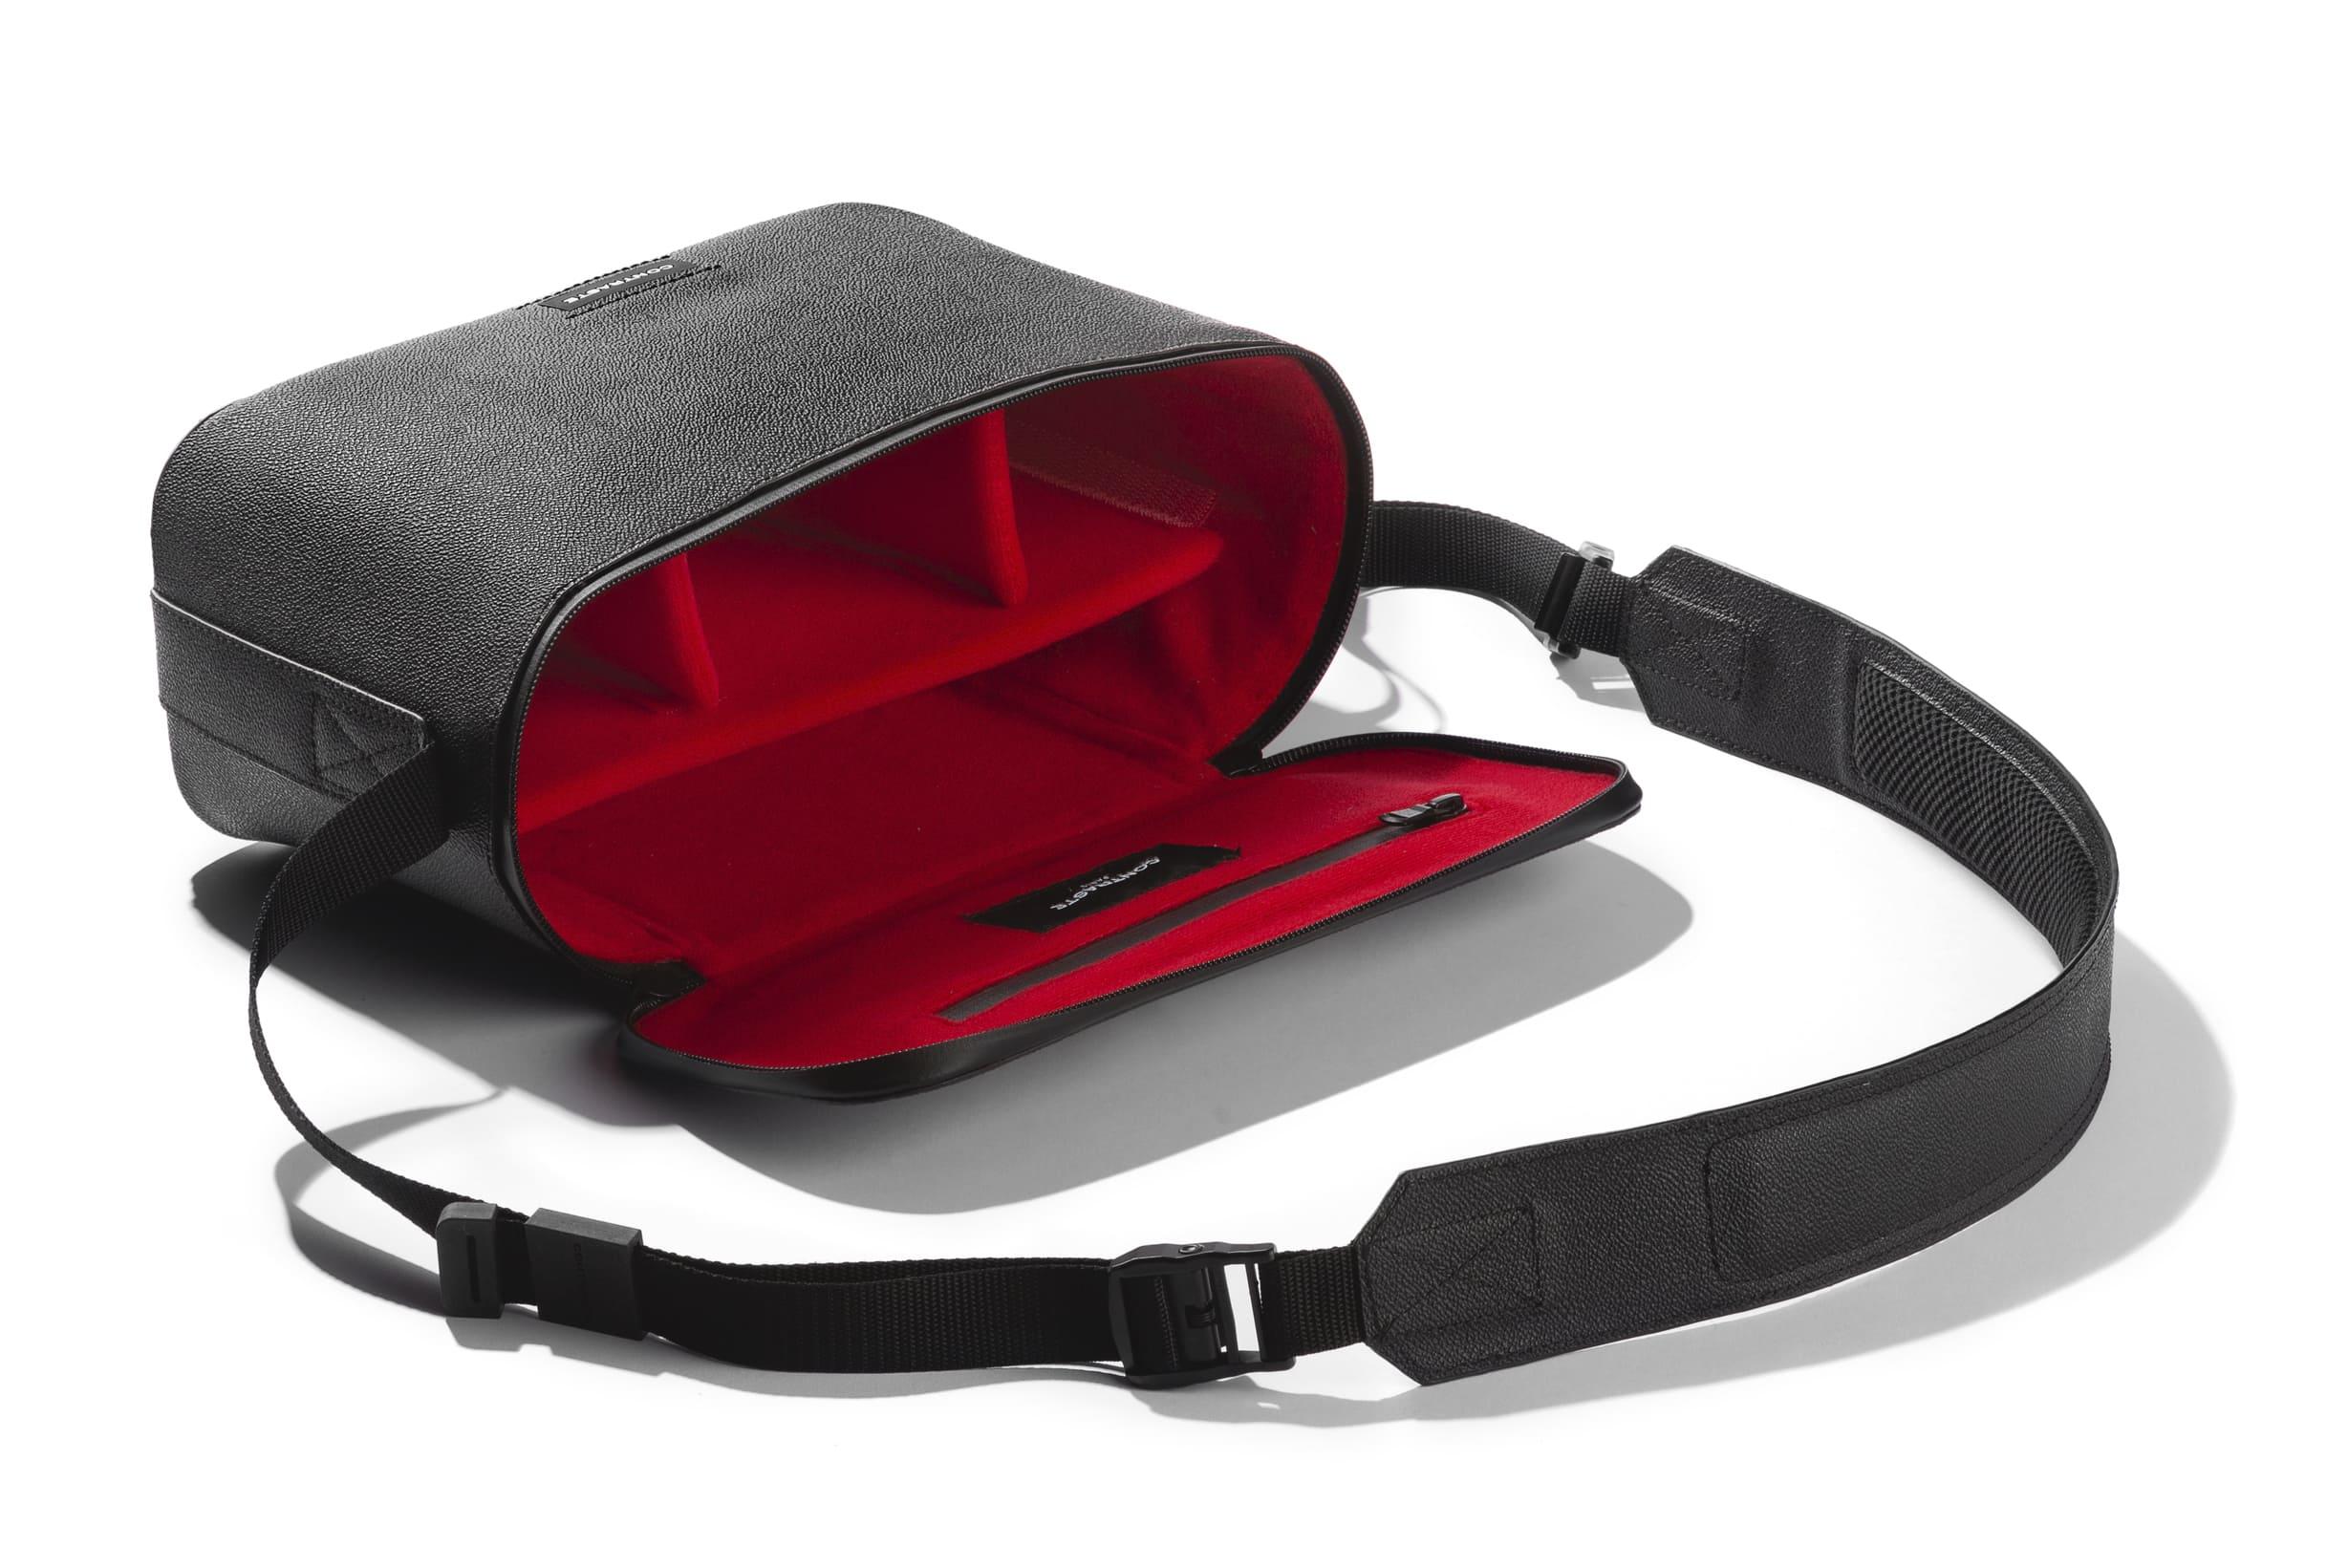 Paris Contrast Shoulder Camera Bag Black Leather Waterproof Travel Photographer Compact Messenger Leica Computer Woman Hiking Compact